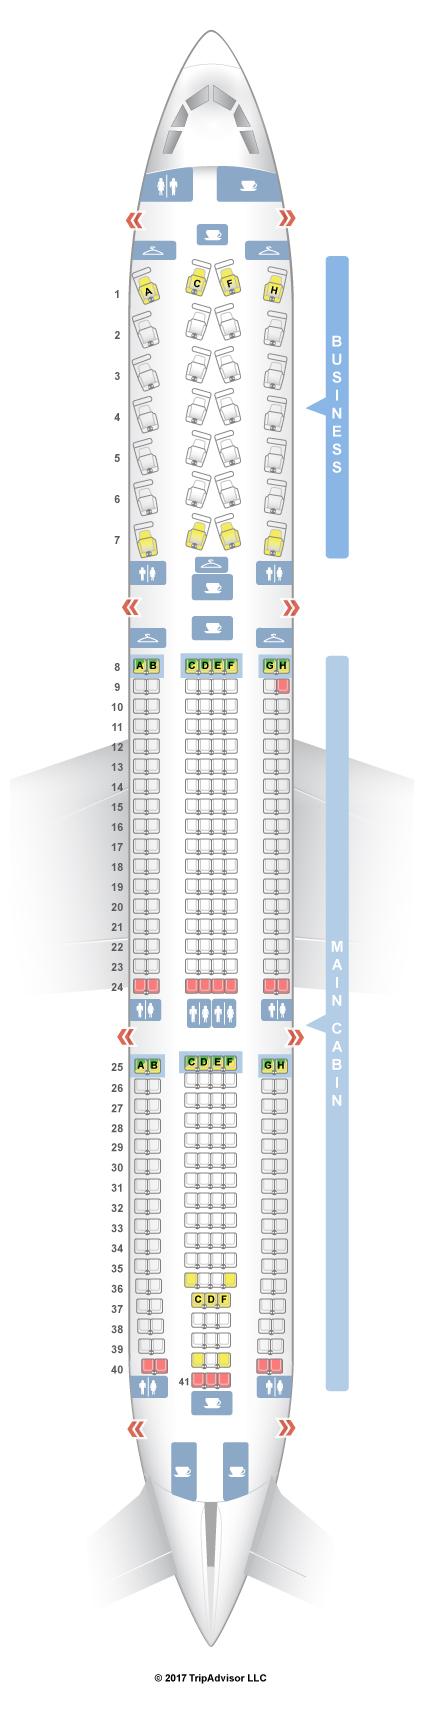 seatguru seat map american airlines airbus a330 300 333